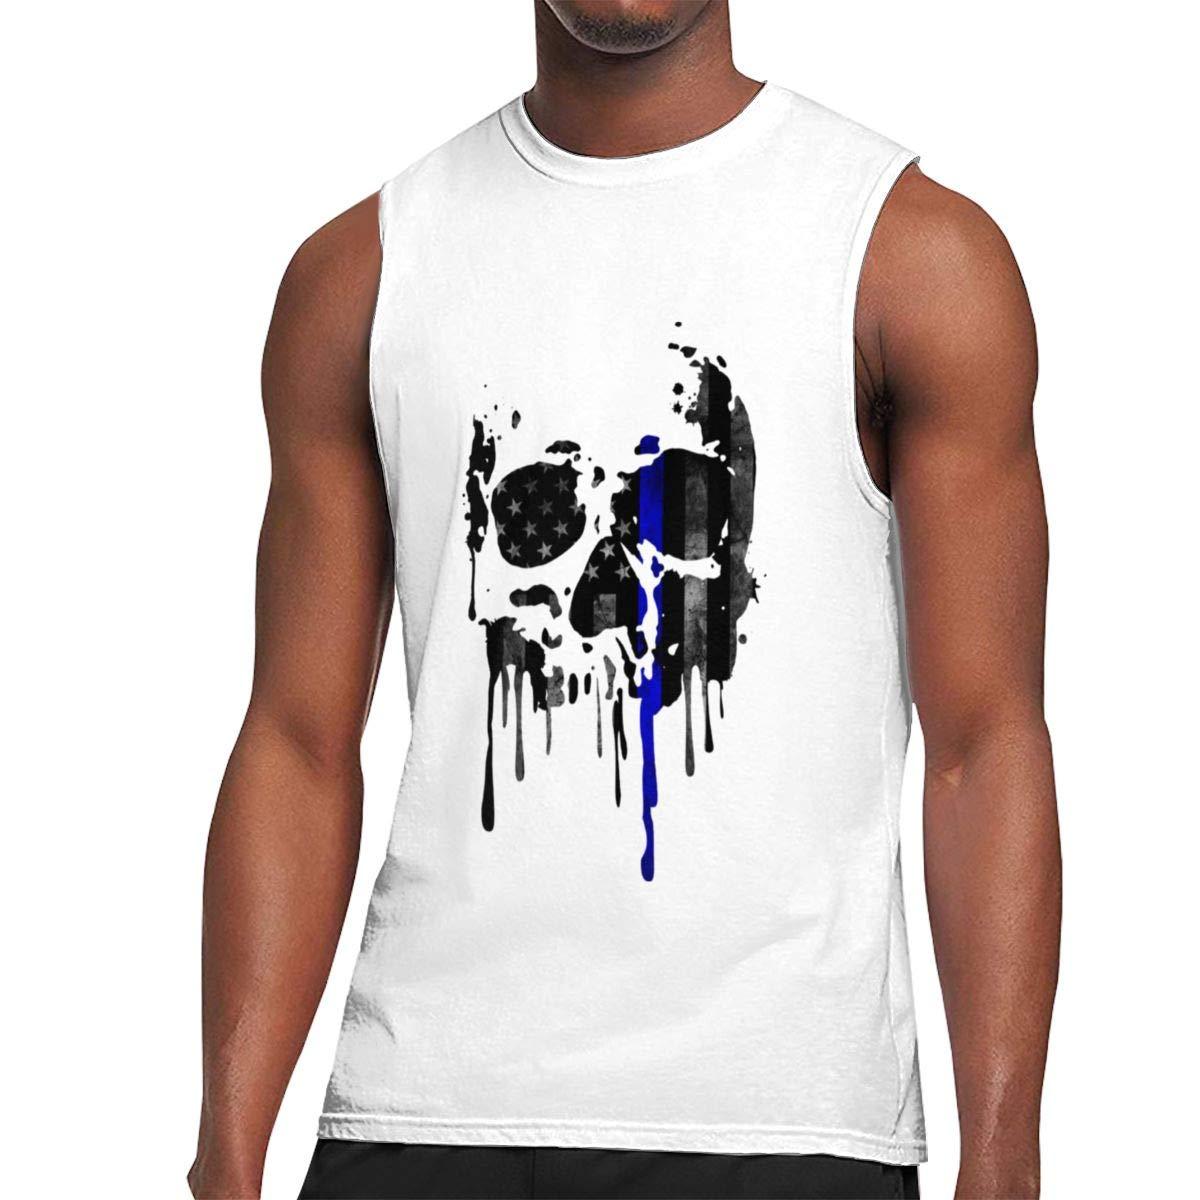 Seuriamin Thin Blue Line S Humor Outdoor Sleeveless Muscle Short Sleeve Shirt